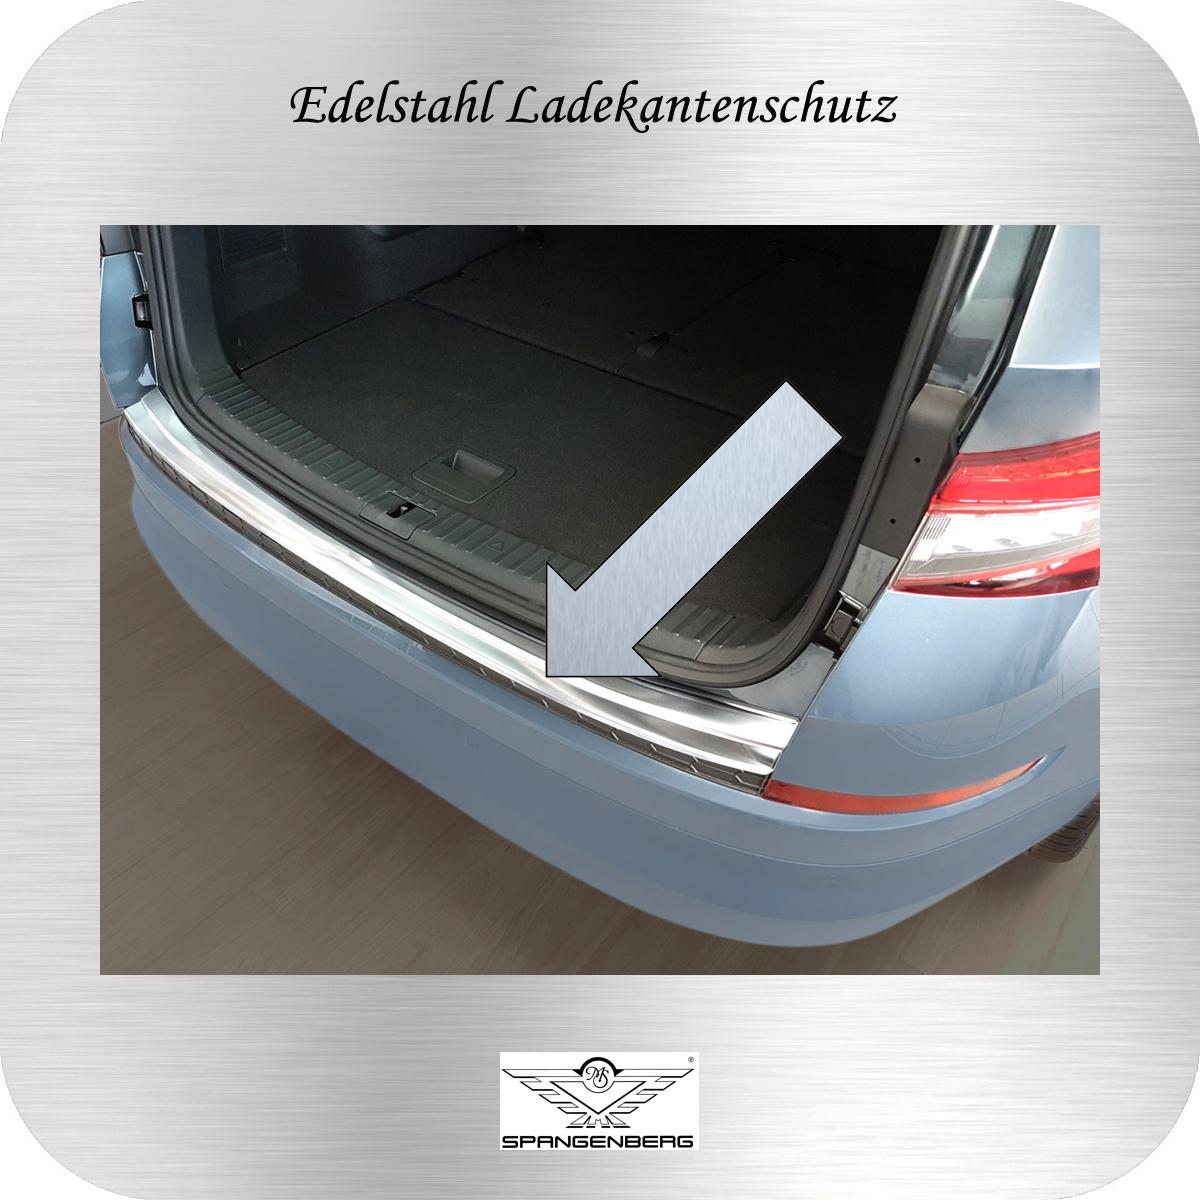 Ladekantenschutz Edelstahl Skoda Kodiaq SUV Kombi 2017- 3235788